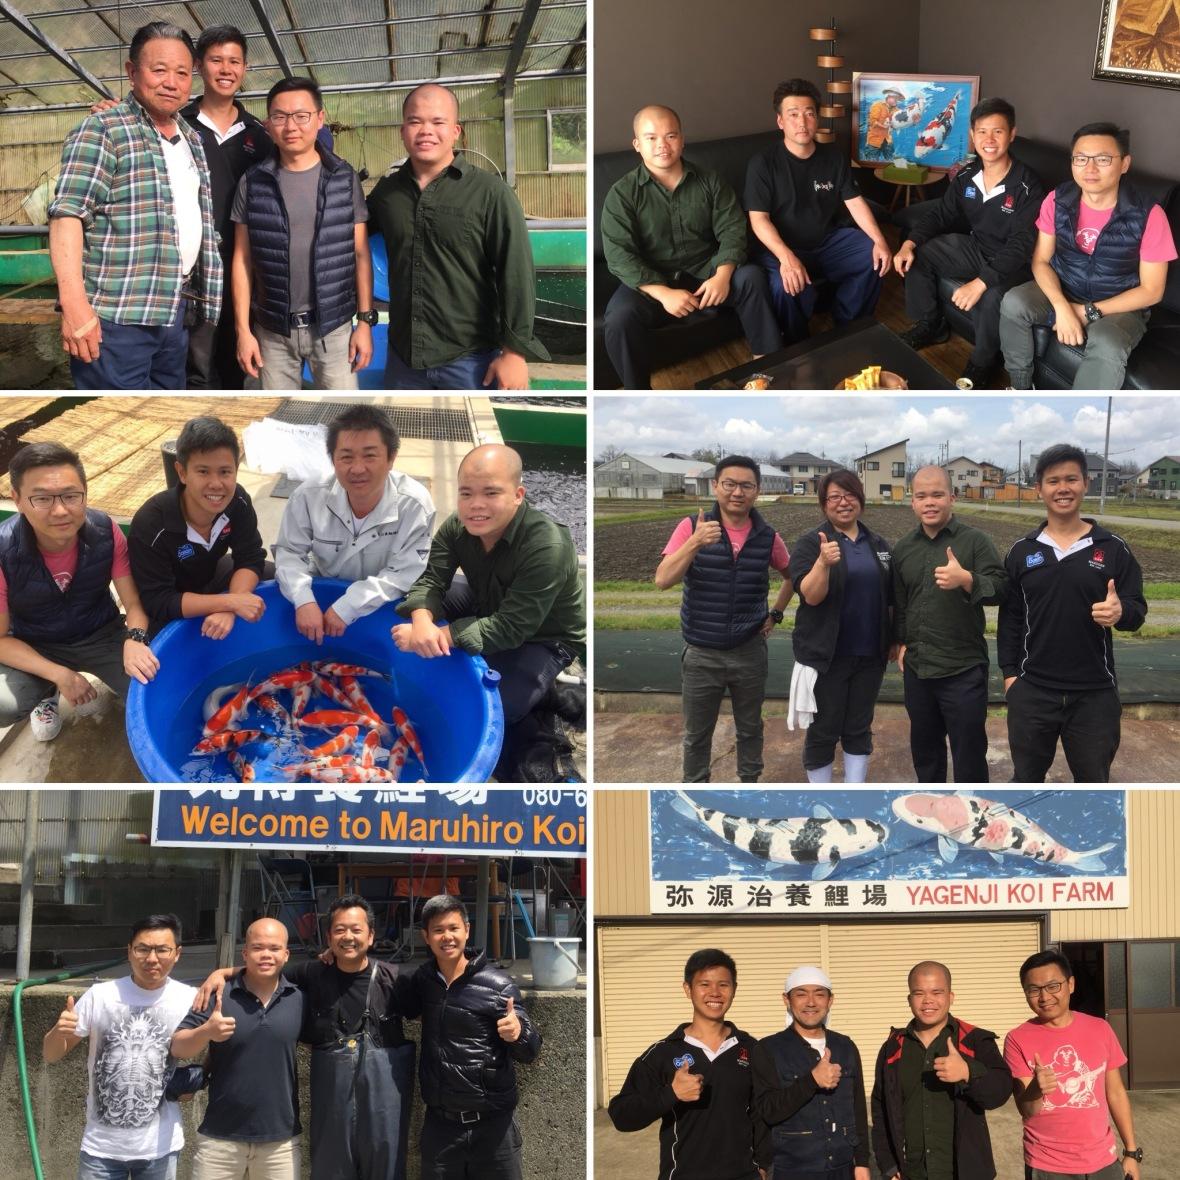 Marugen Koi Farm with Koi Breeders In Niigata Japan